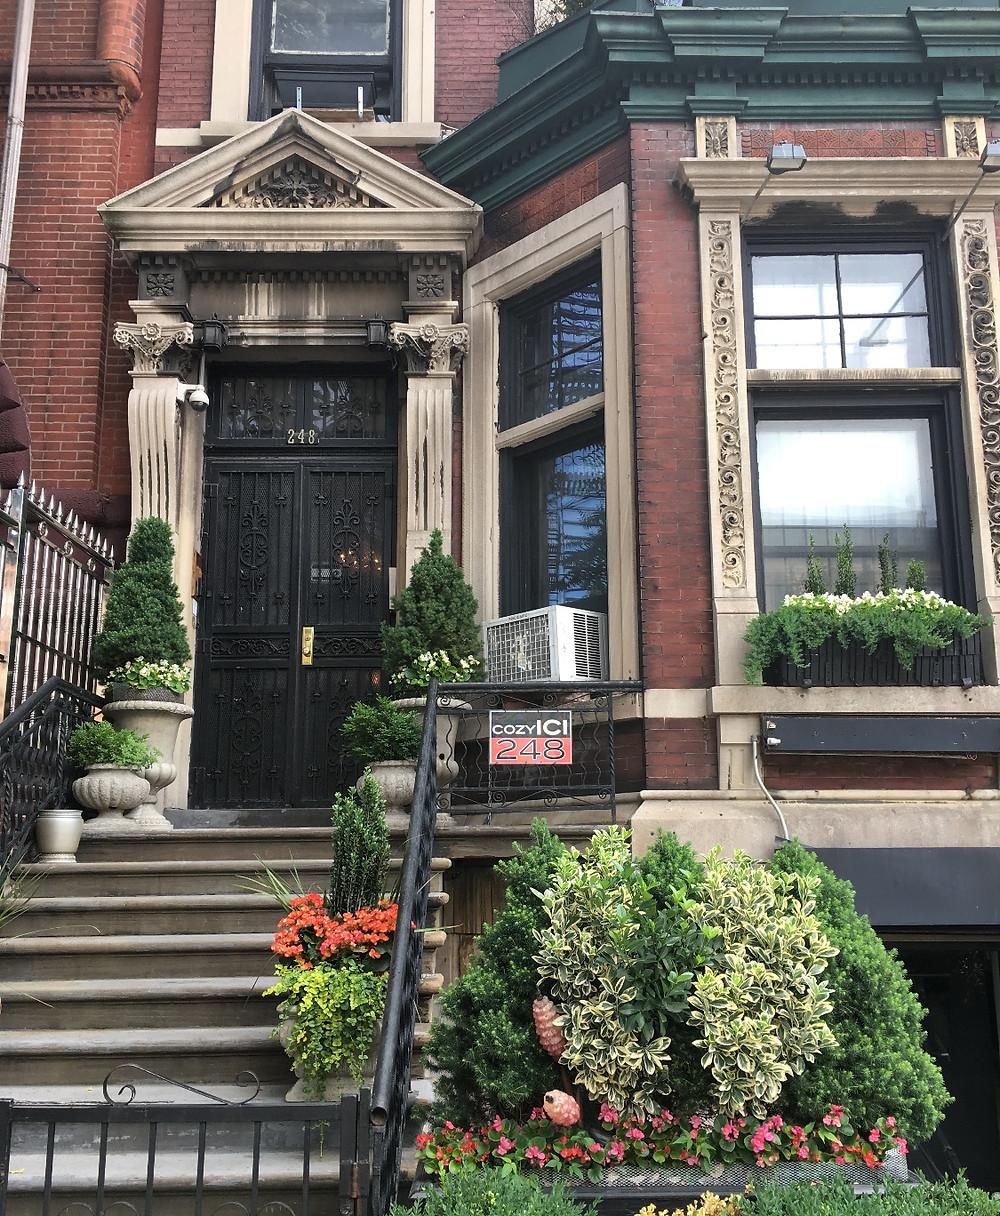 The International Cozy Inn on Lenox Avenue in Harlem